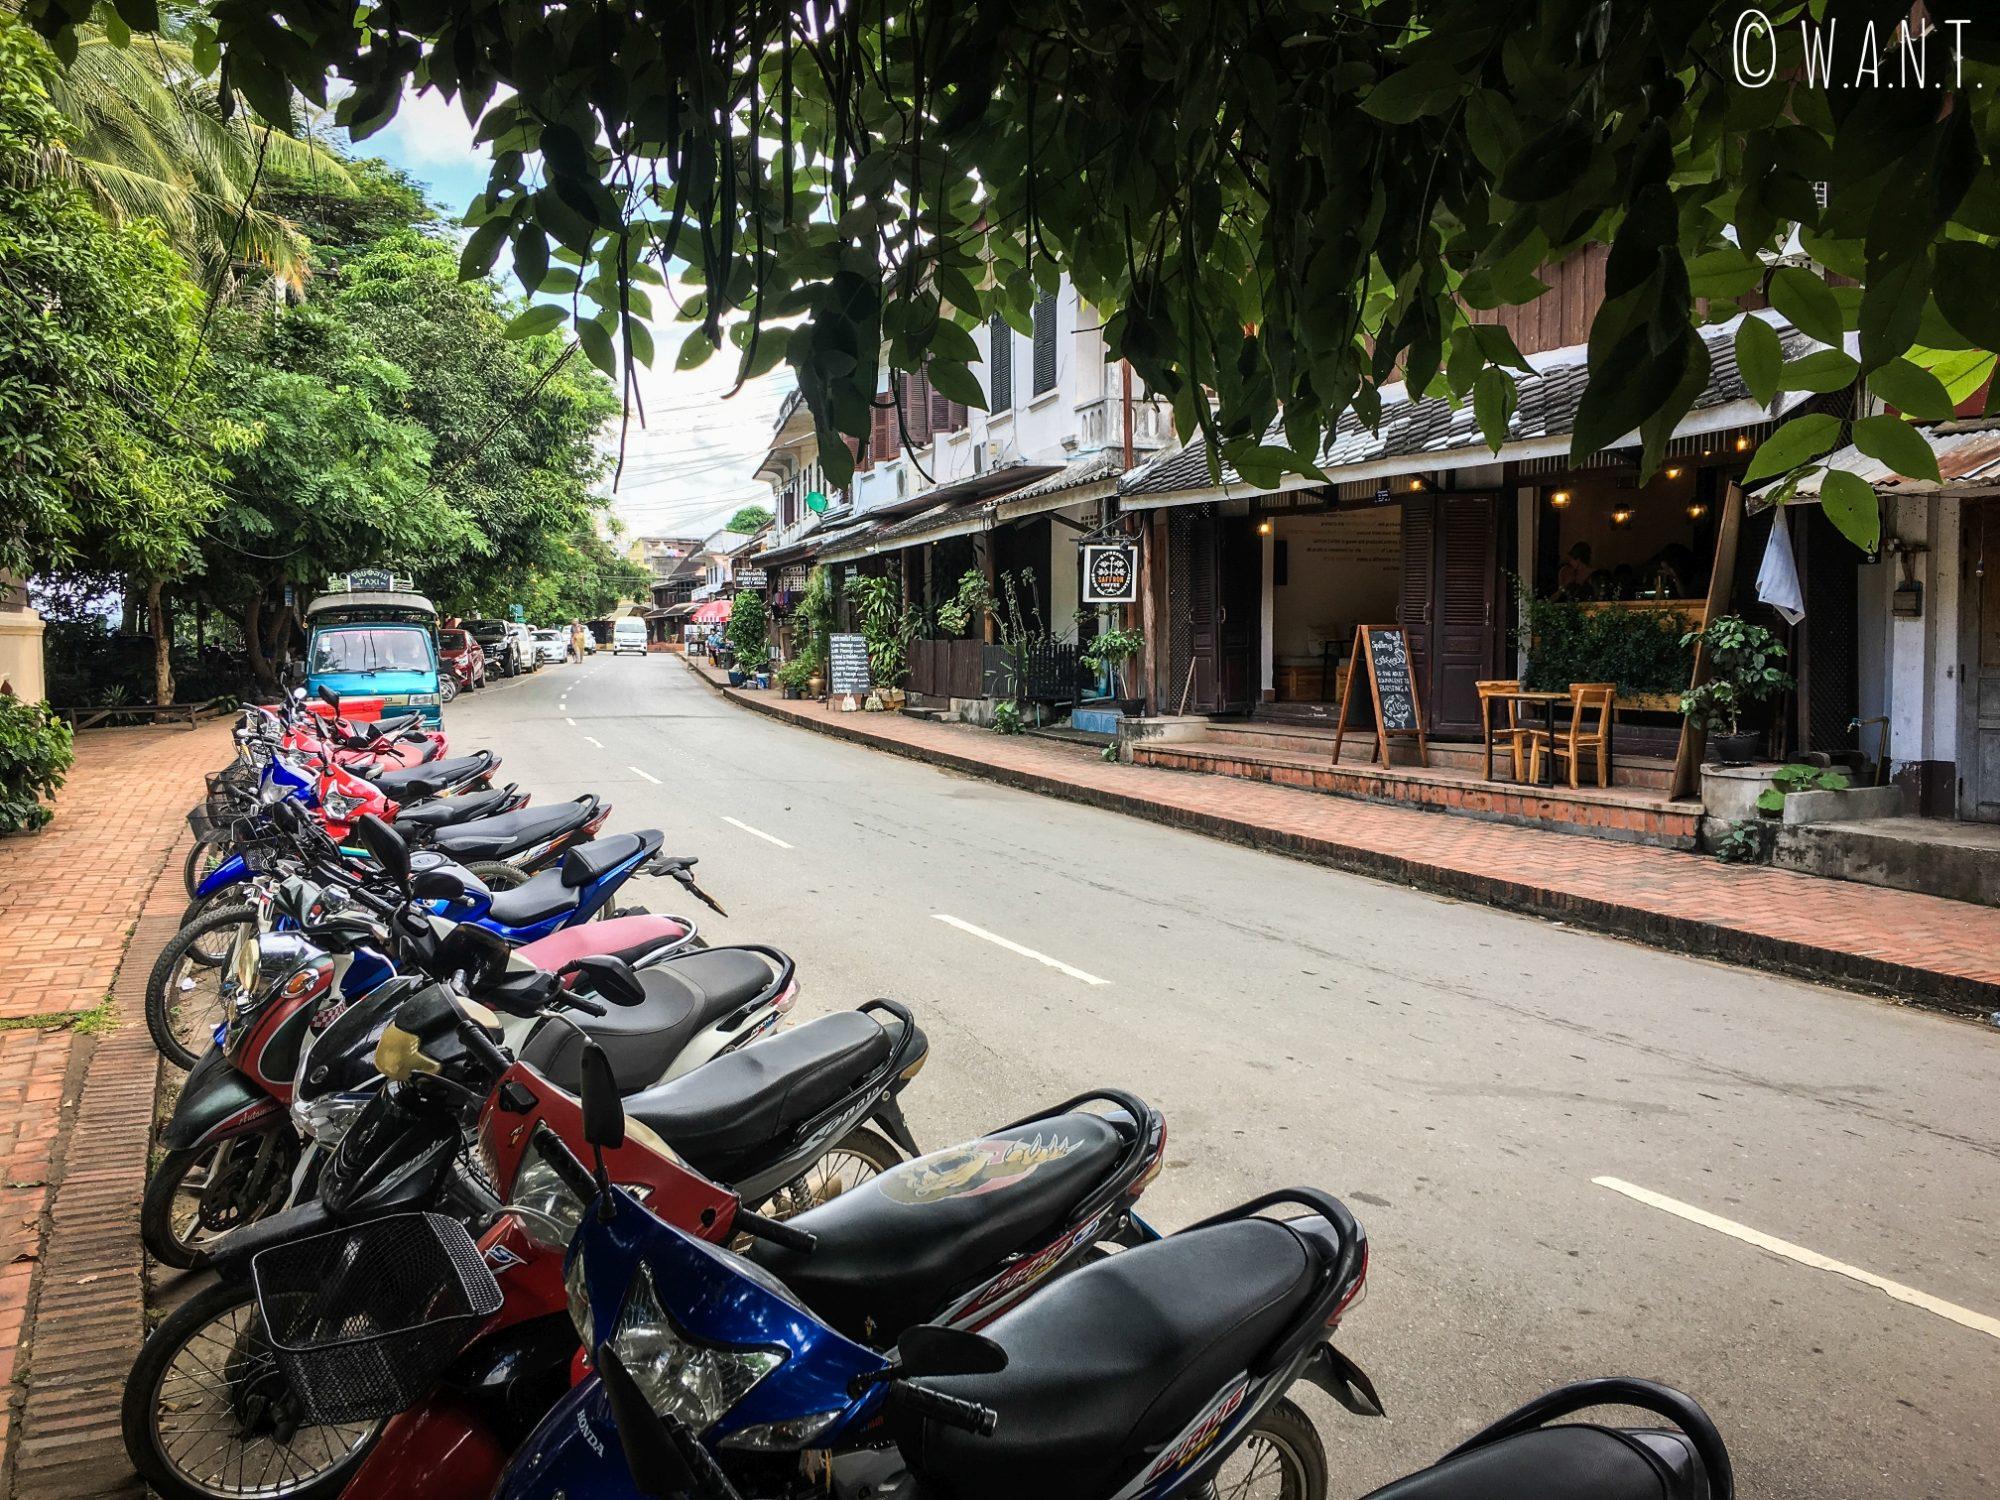 Rue longeant le Mékong à Luang Prabang